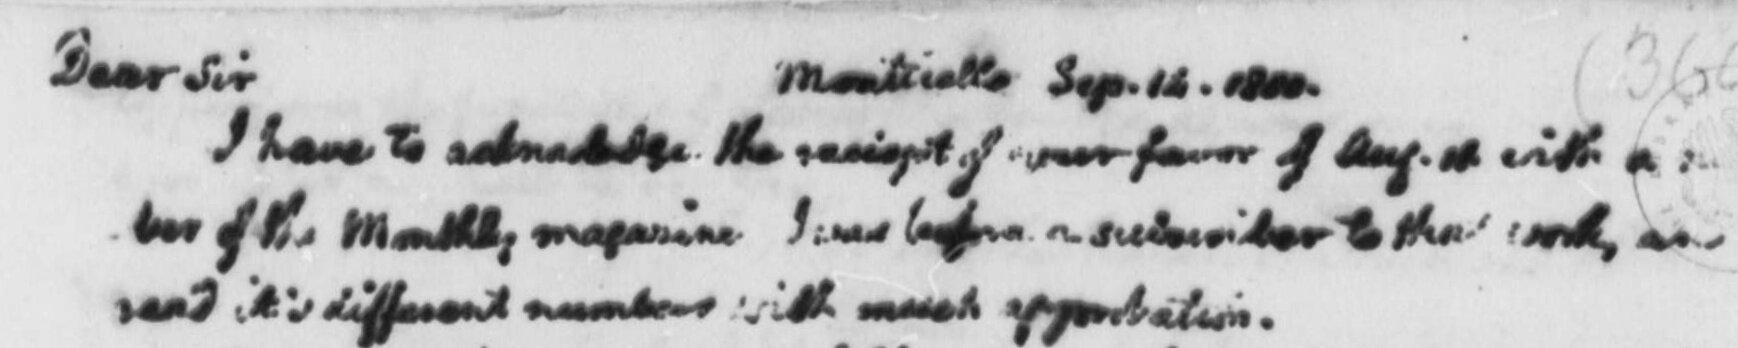 Miller, Samuel, September 14, 1800 Letter to Thomas Jefferson Title Page.jpg